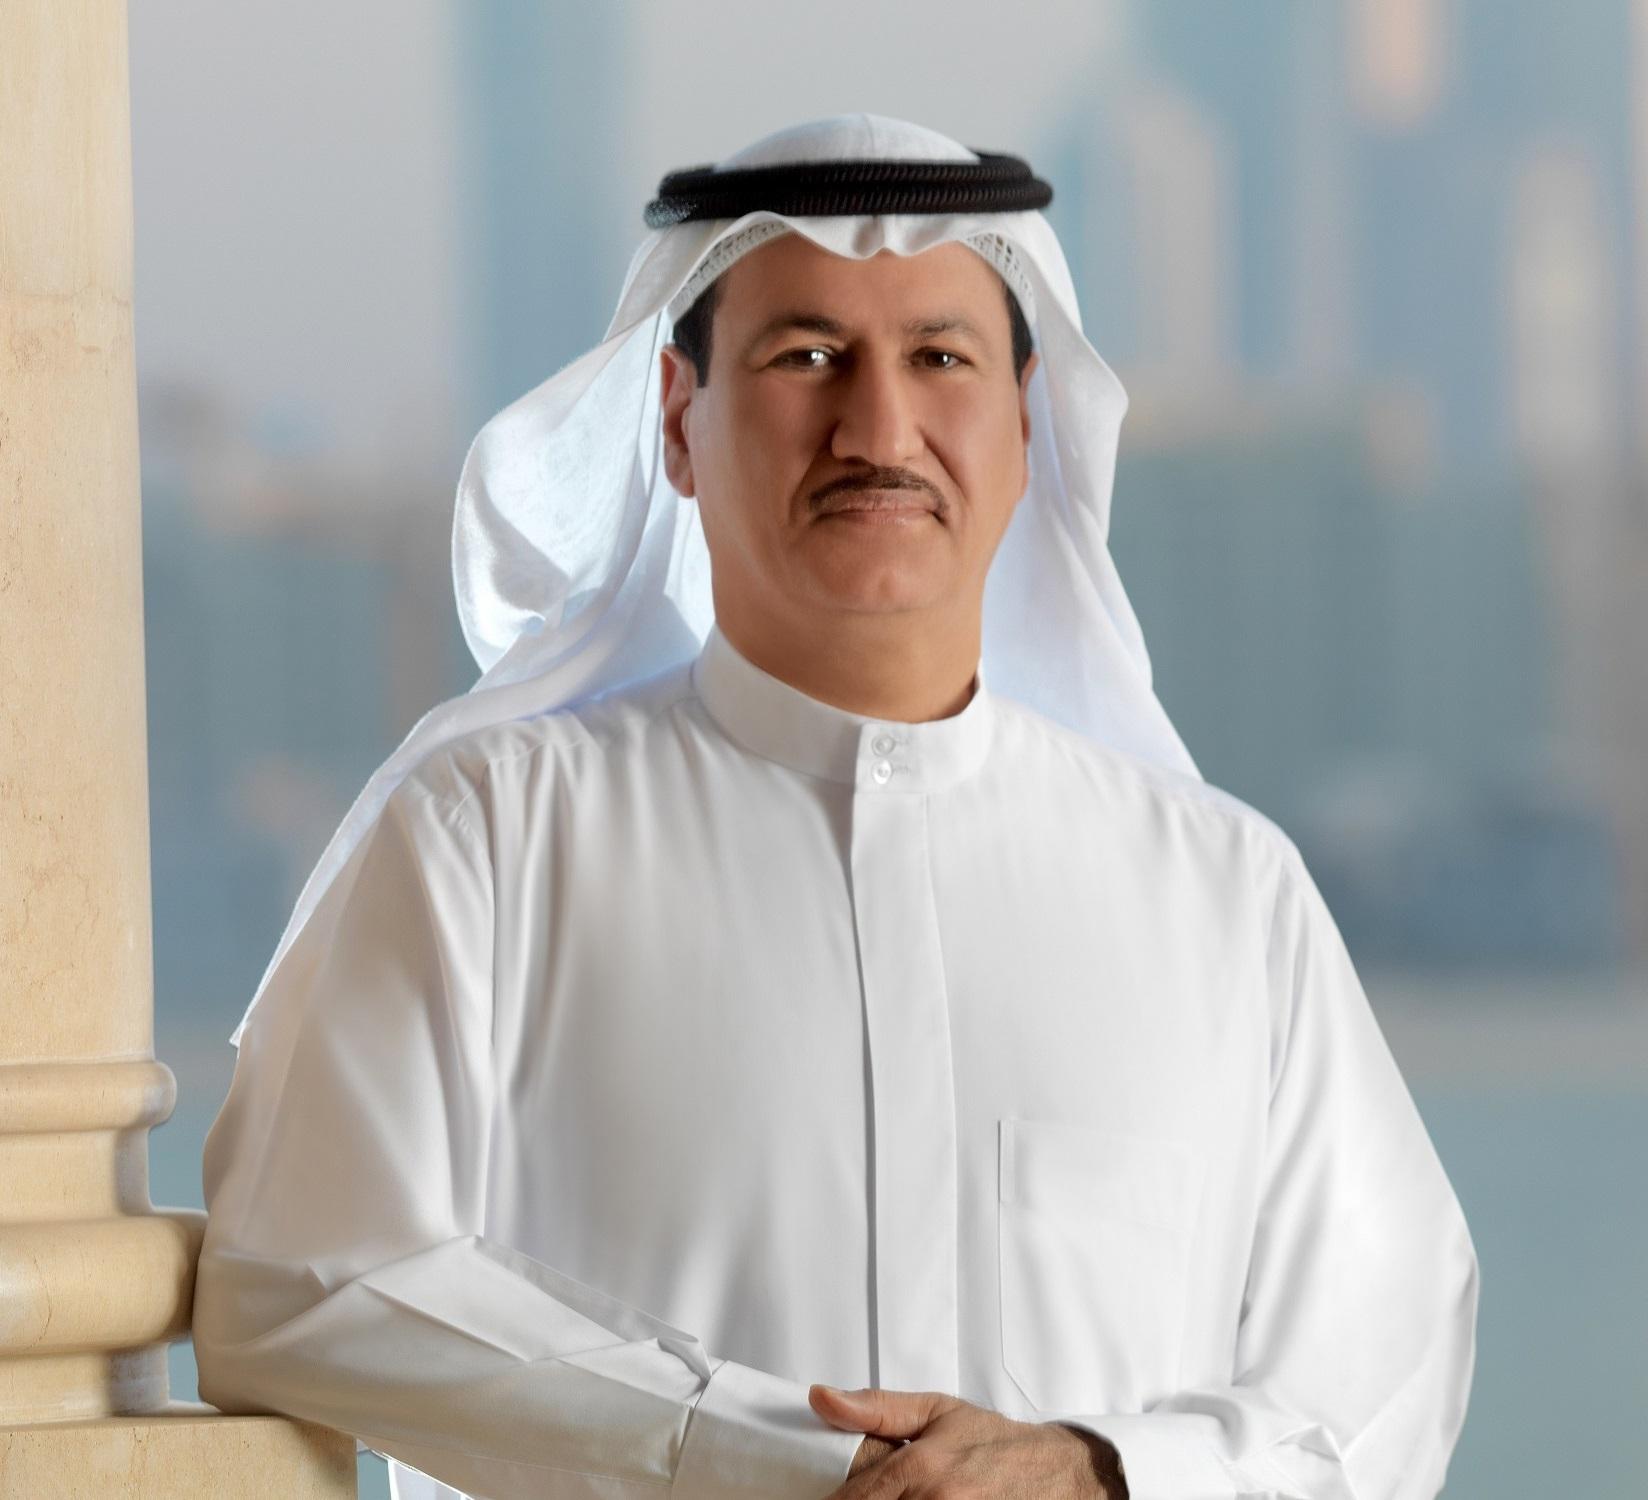 #26 Hussain Sajwani, Chairman of DAMAC Properties